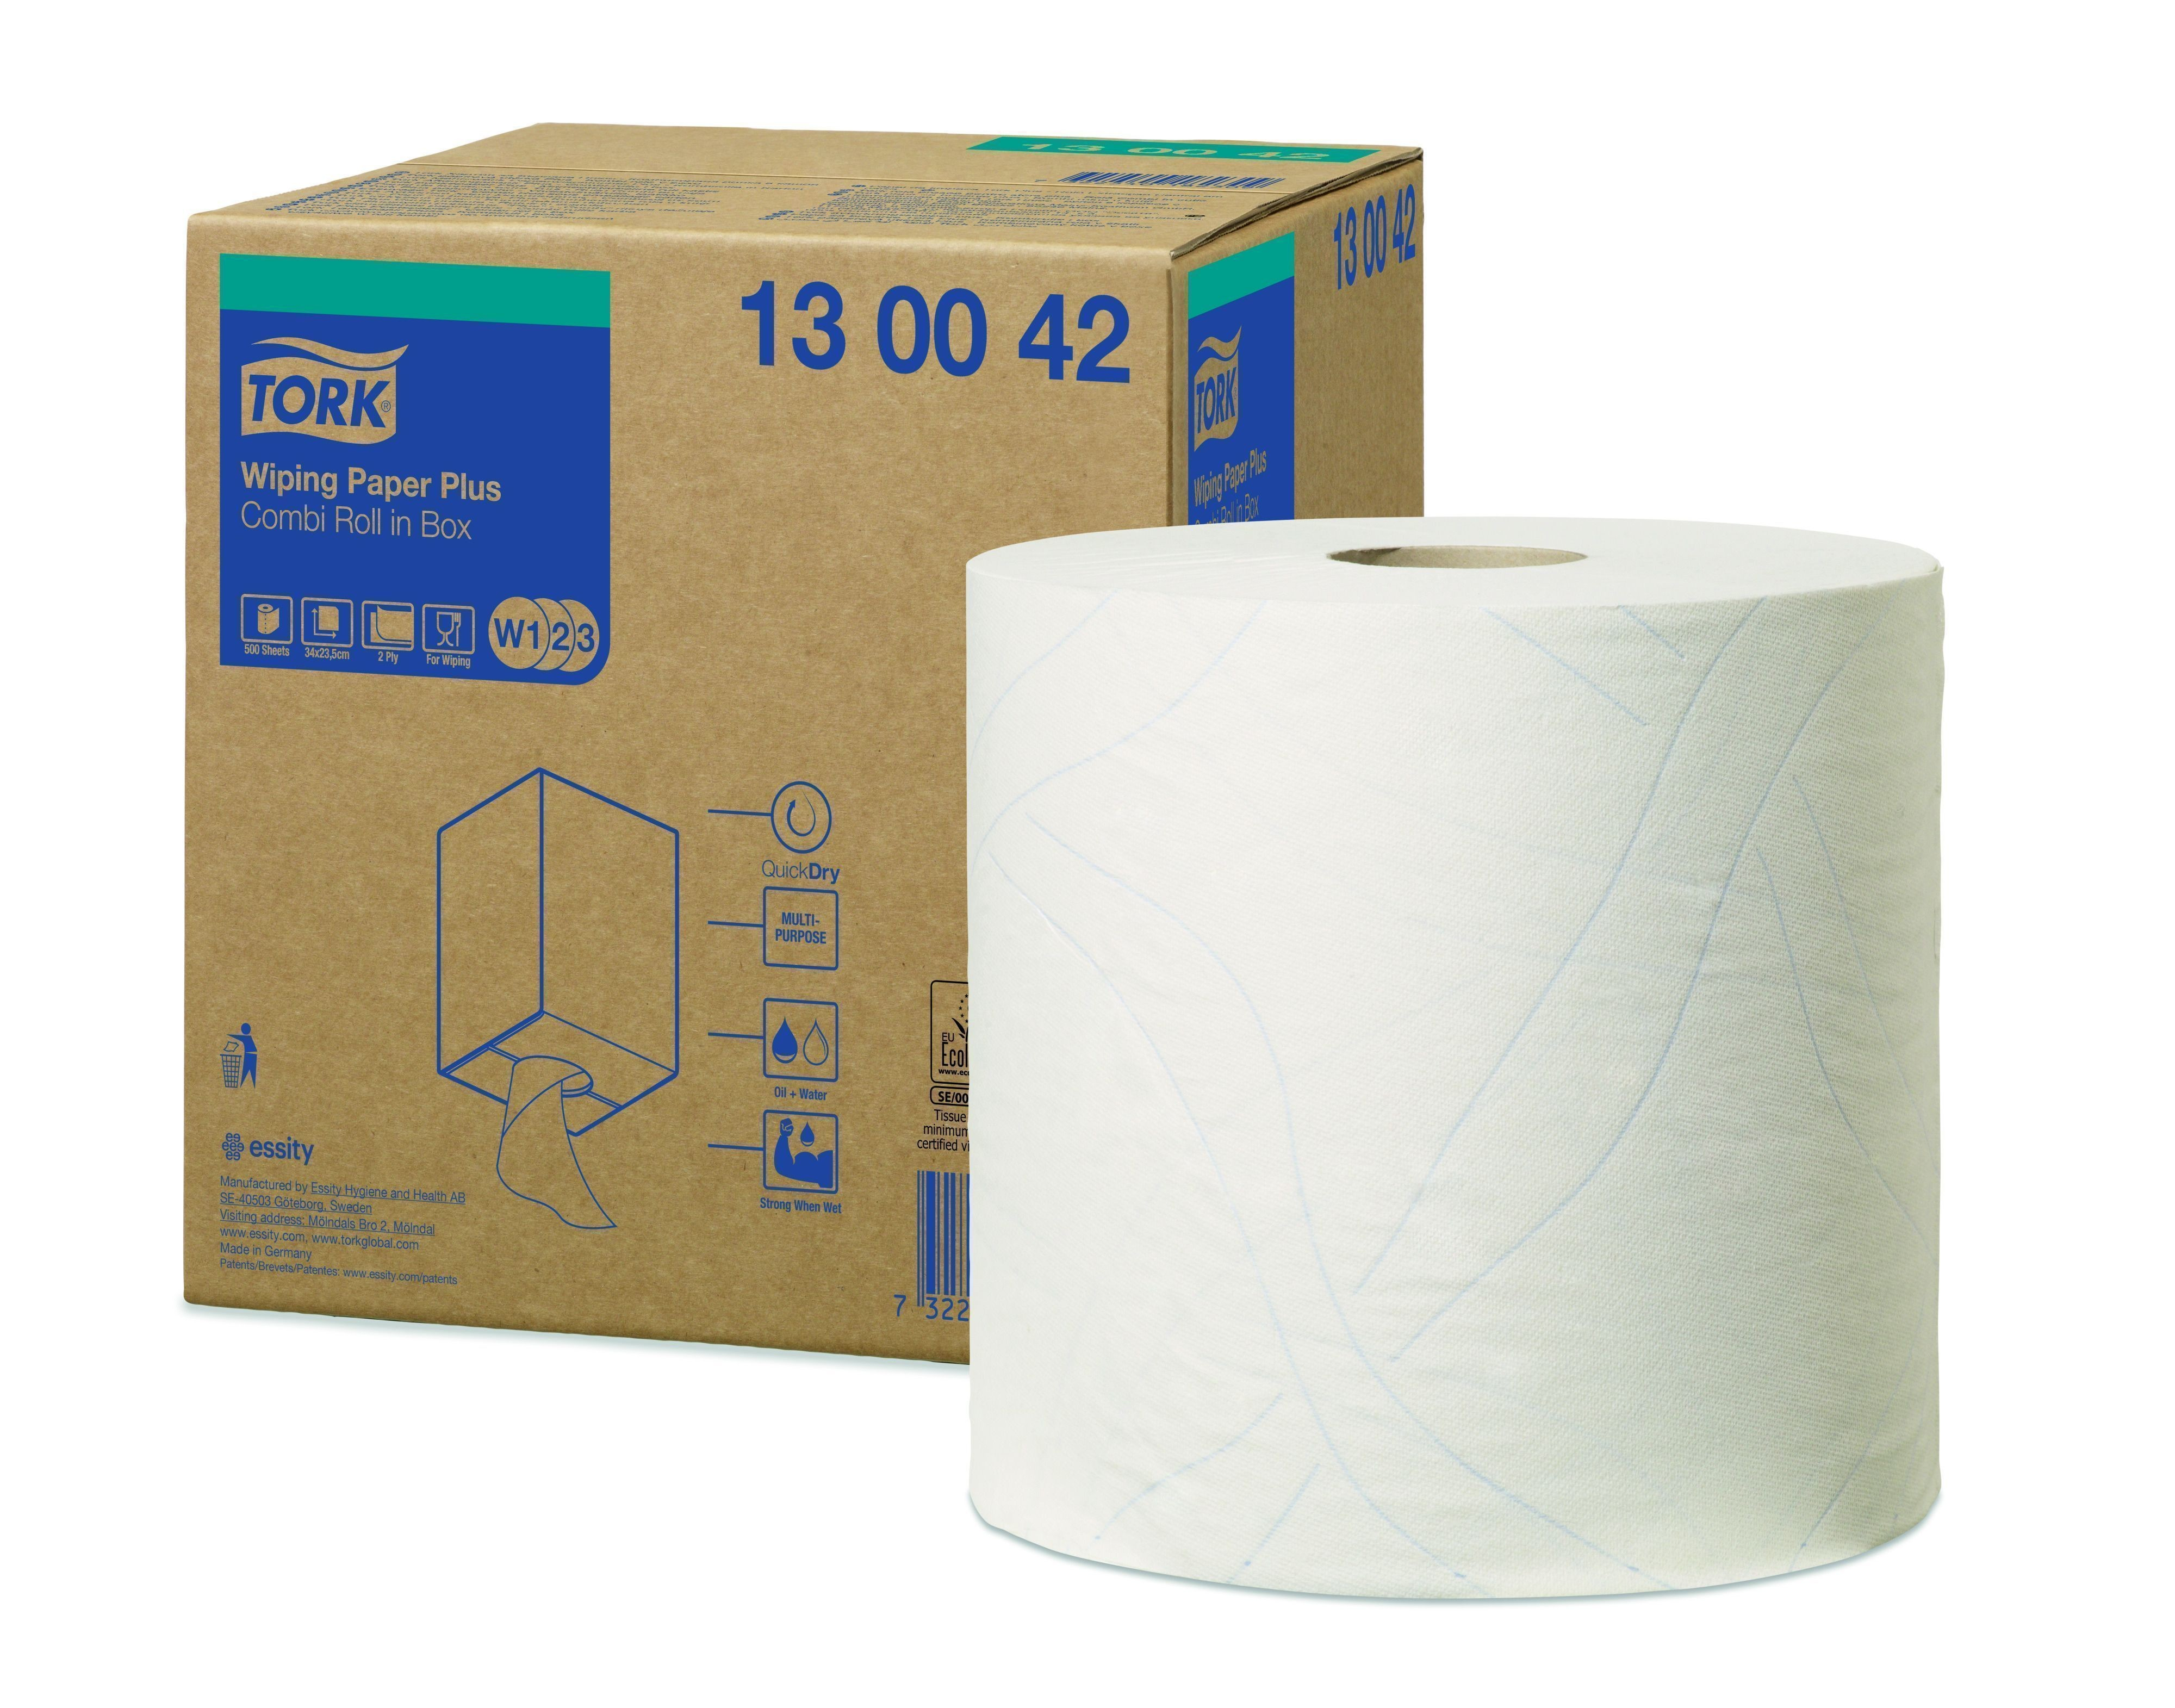 ORK Wiping Paper Plus 1roll 130042 Wiper 420